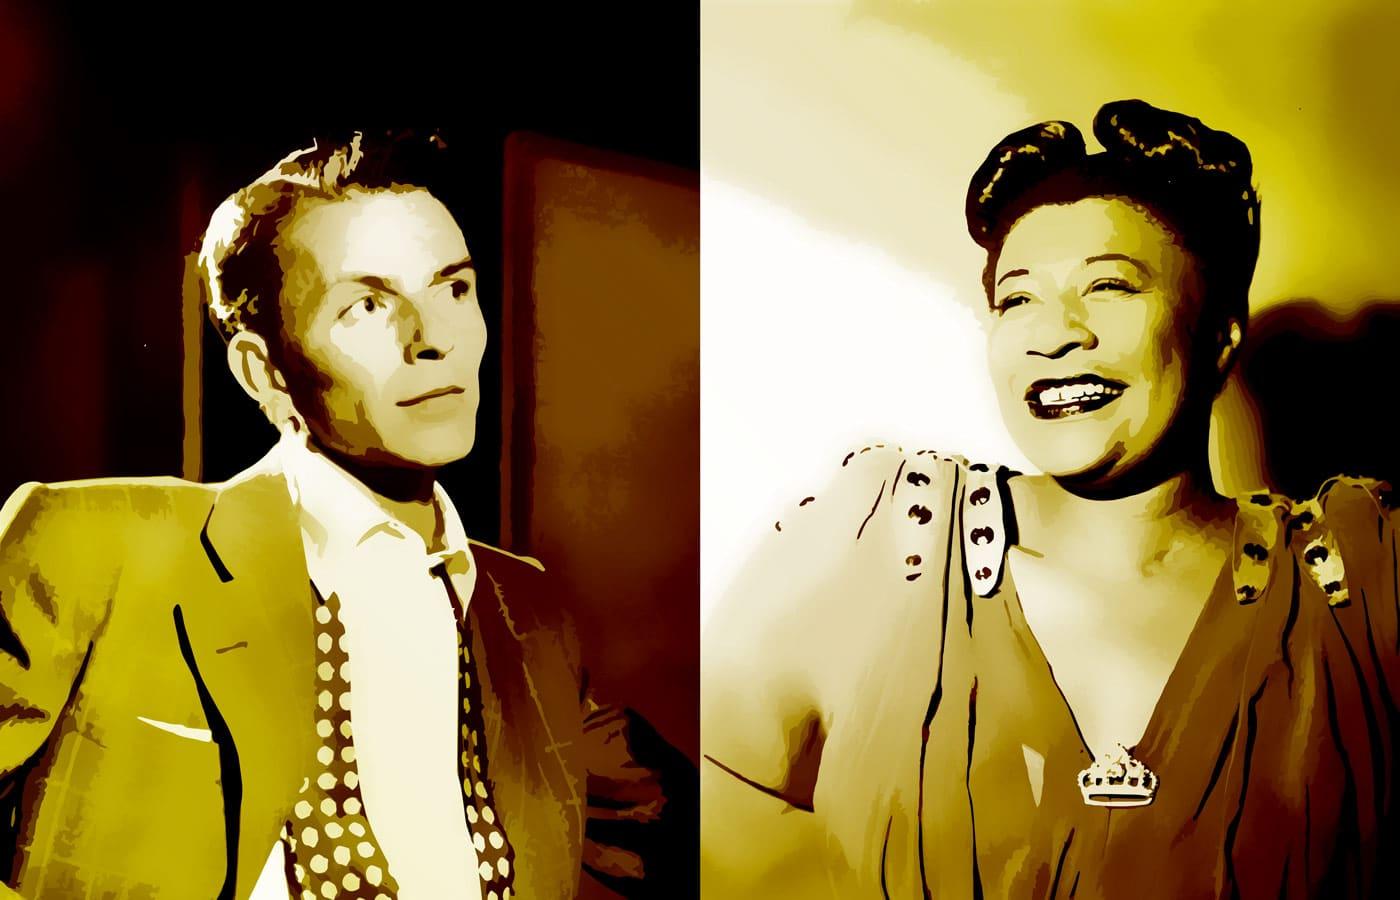 Photo of Frank Sinatra and Ella Fitzgerald